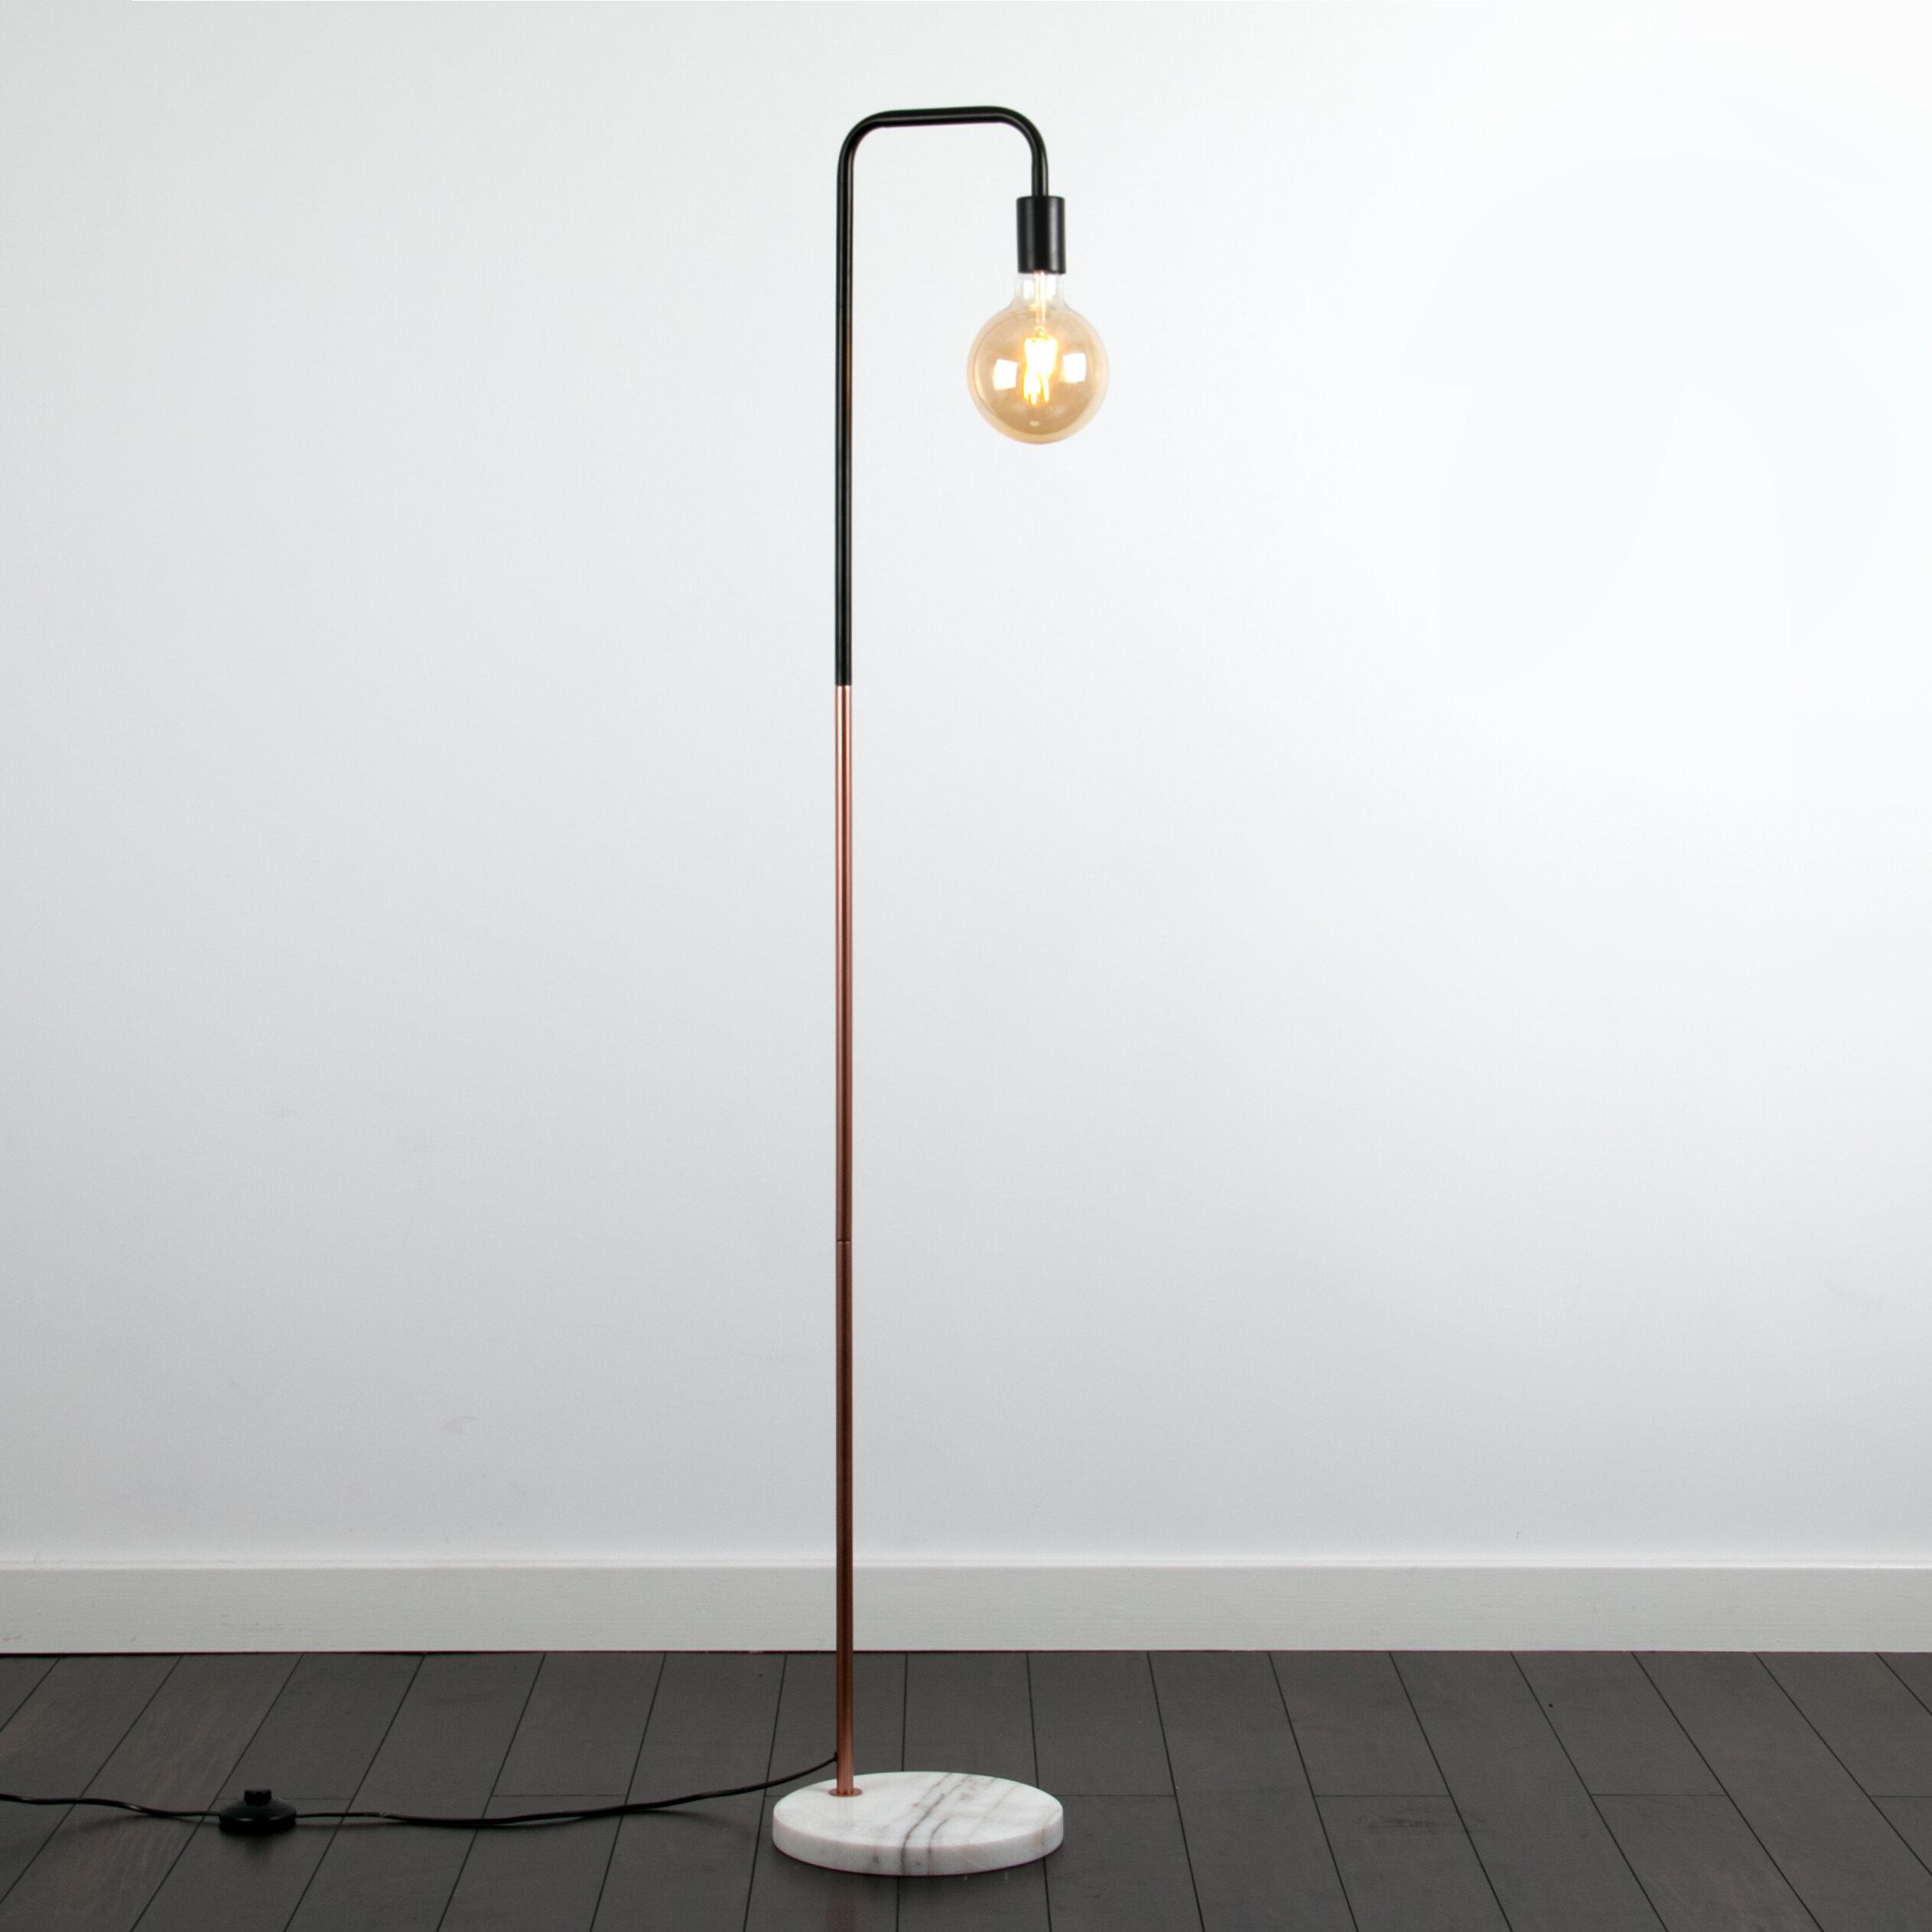 Mcgregor 153cm Arched Floor Lamp